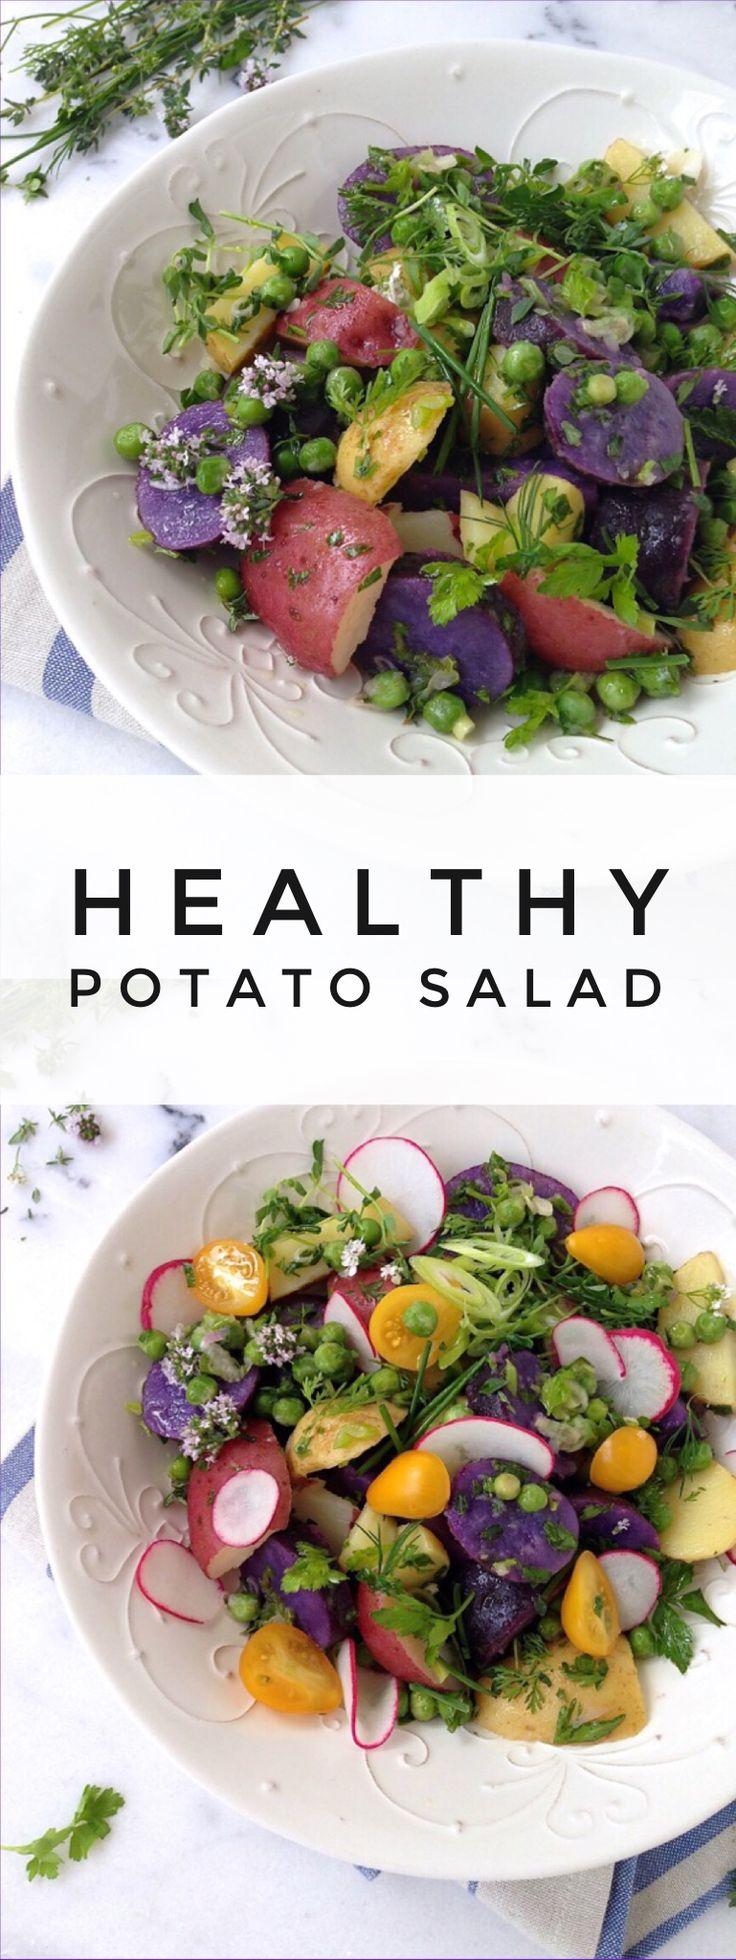 Healthy Potato Salad Recipe | CiaoFlorentina.com @CiaoFlorentina